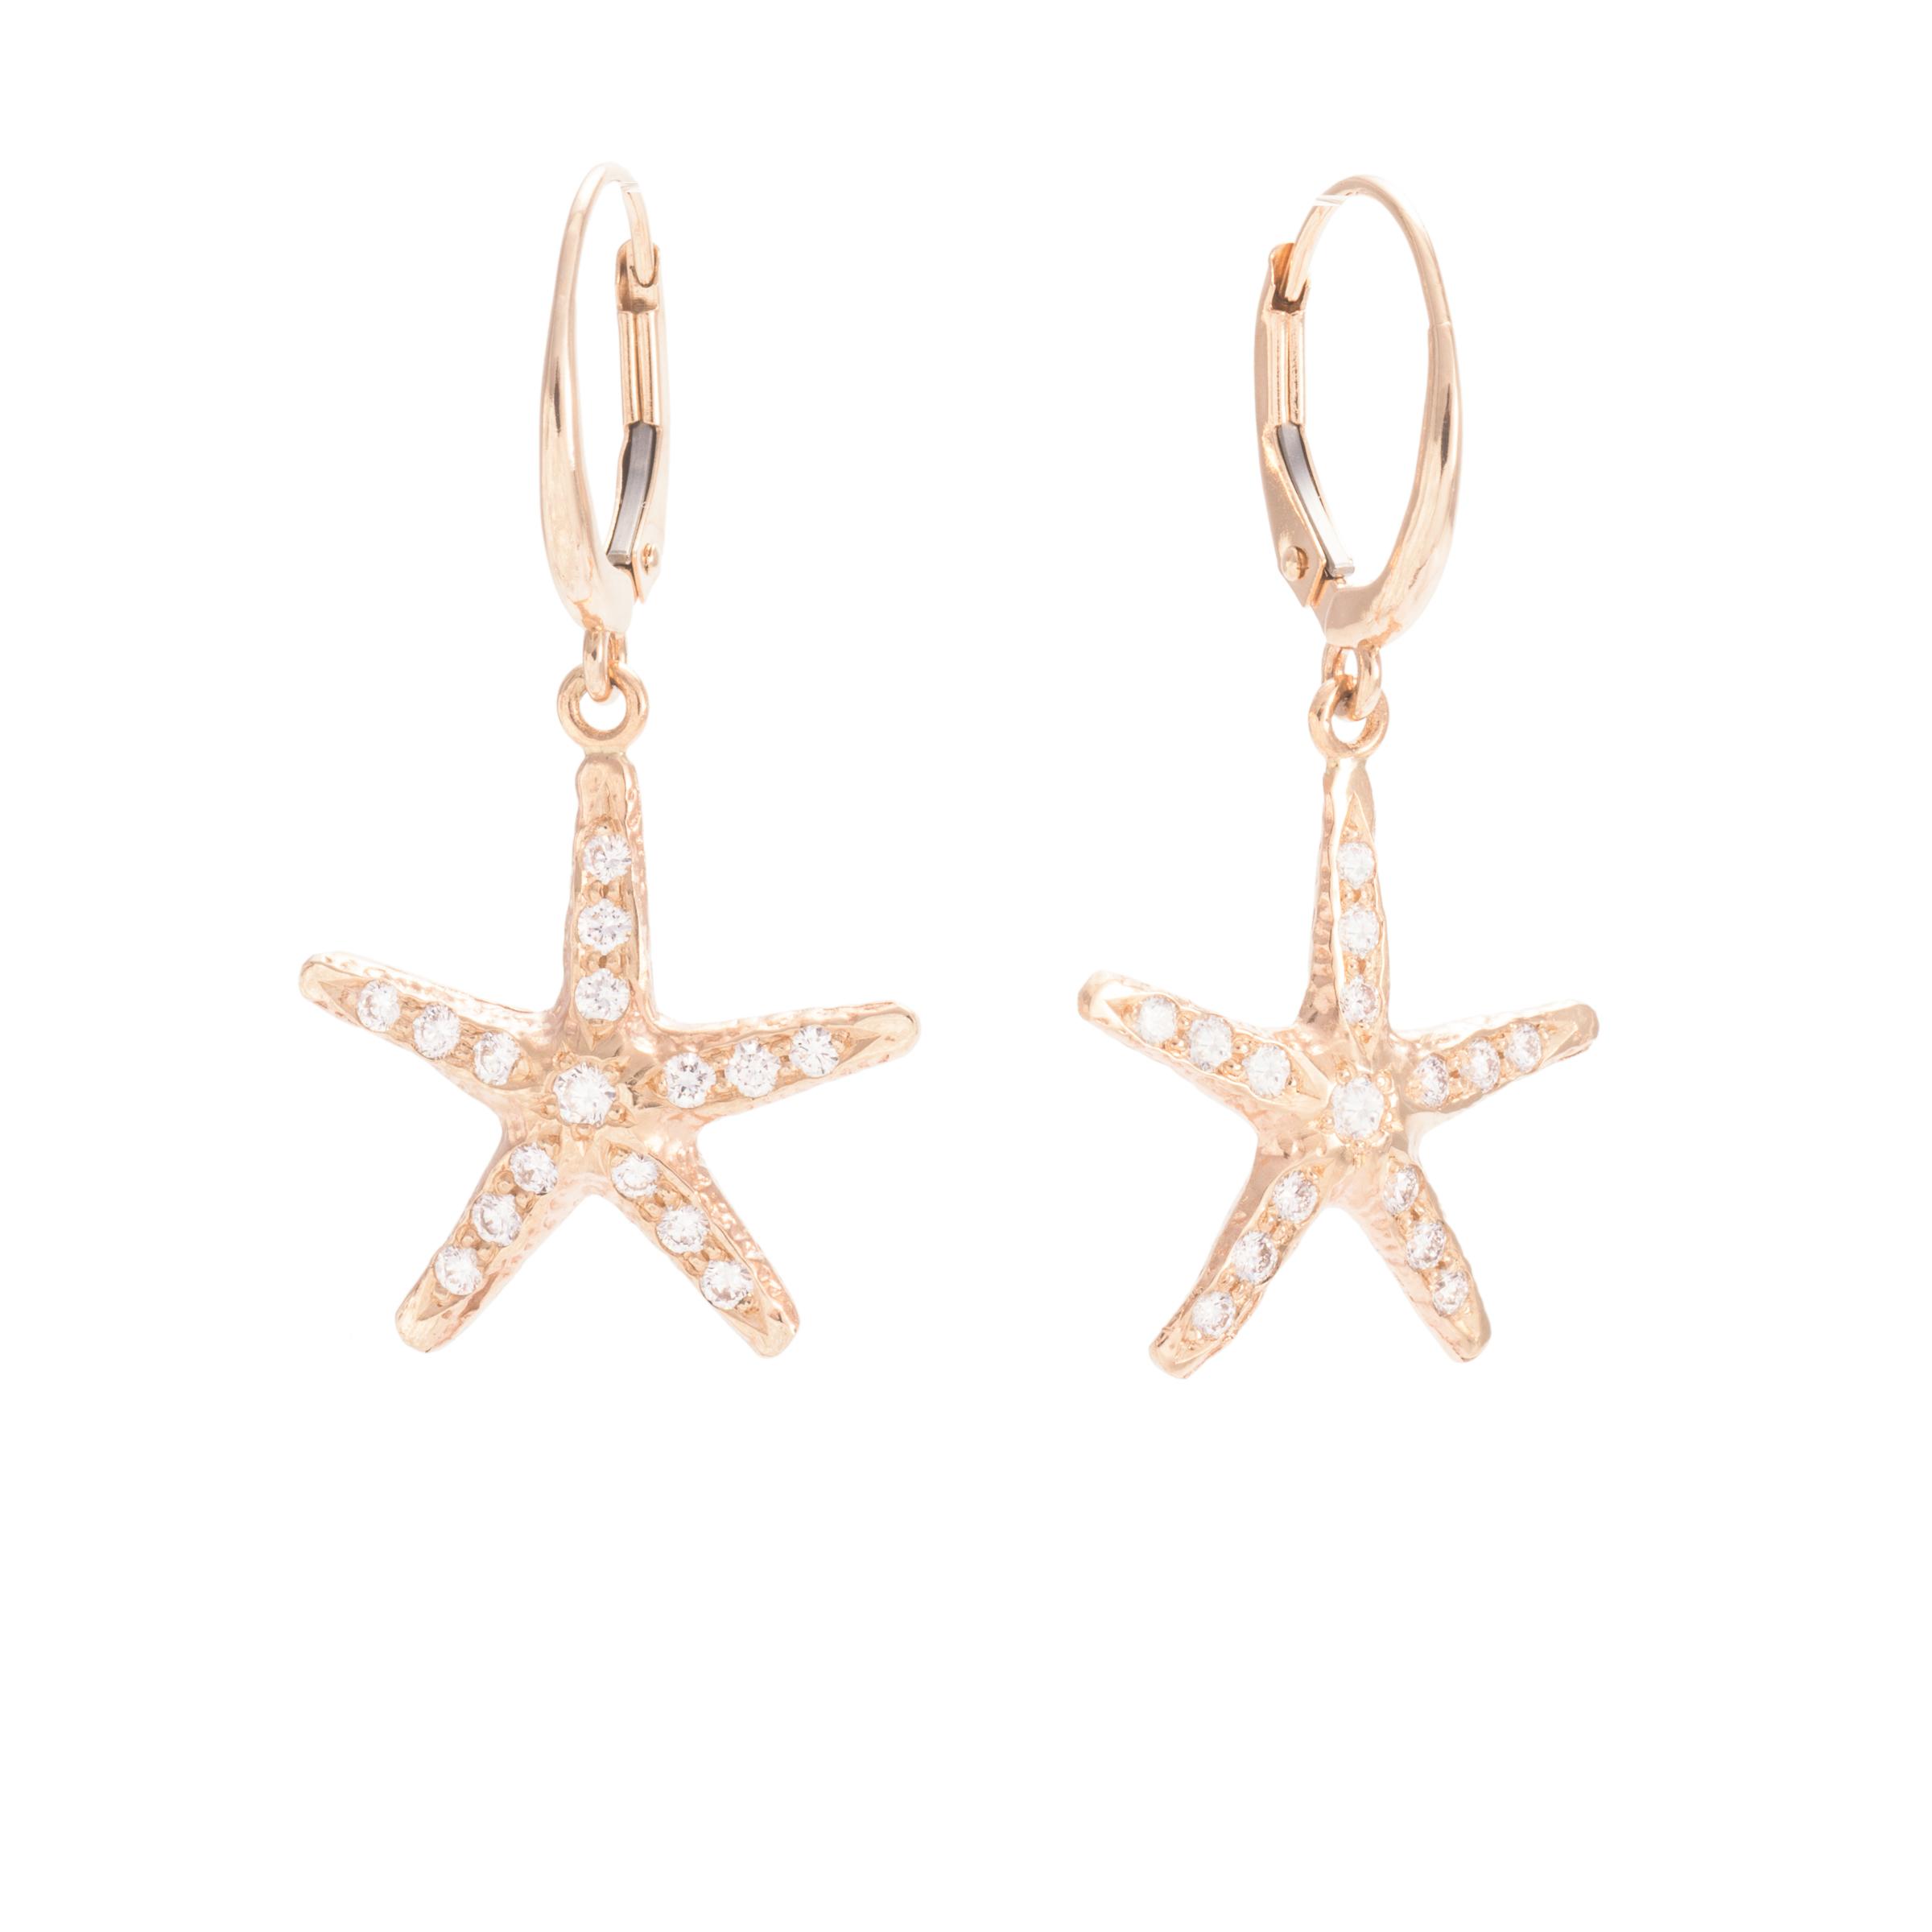 Diamond and 14KY Gold Starfish Earrings by Petri Kymlander $1580